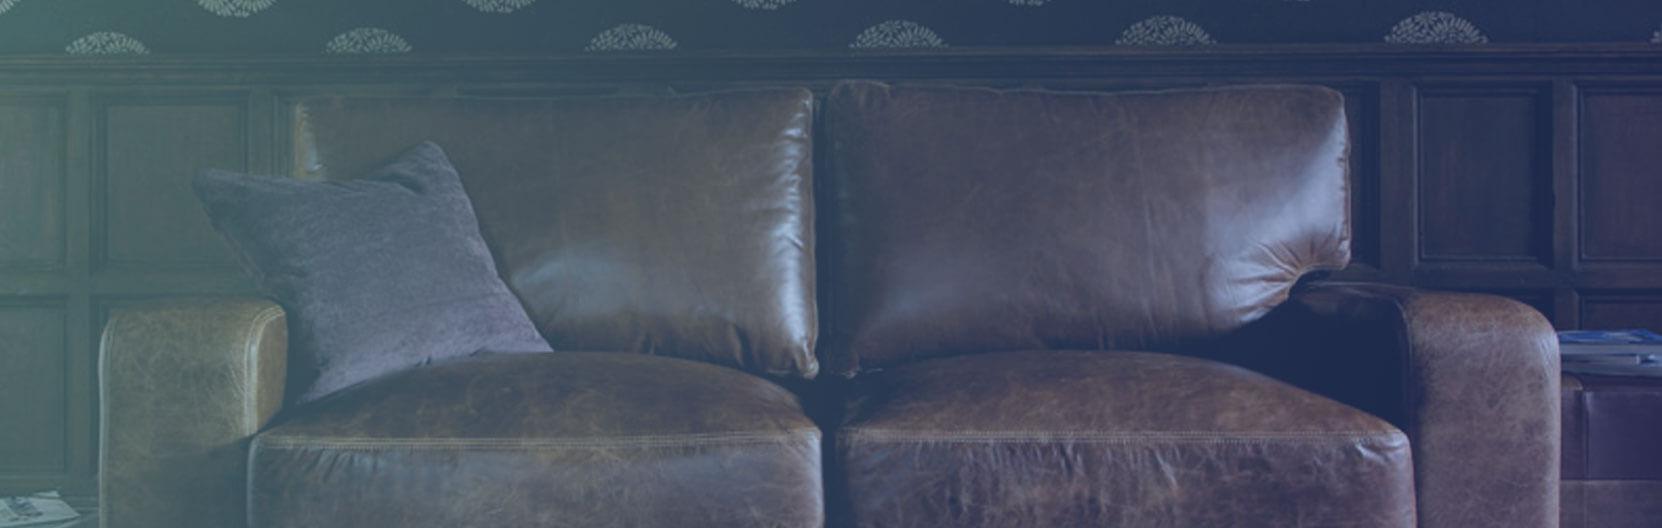 art services cuir textiles et tapis strasbourg. Black Bedroom Furniture Sets. Home Design Ideas